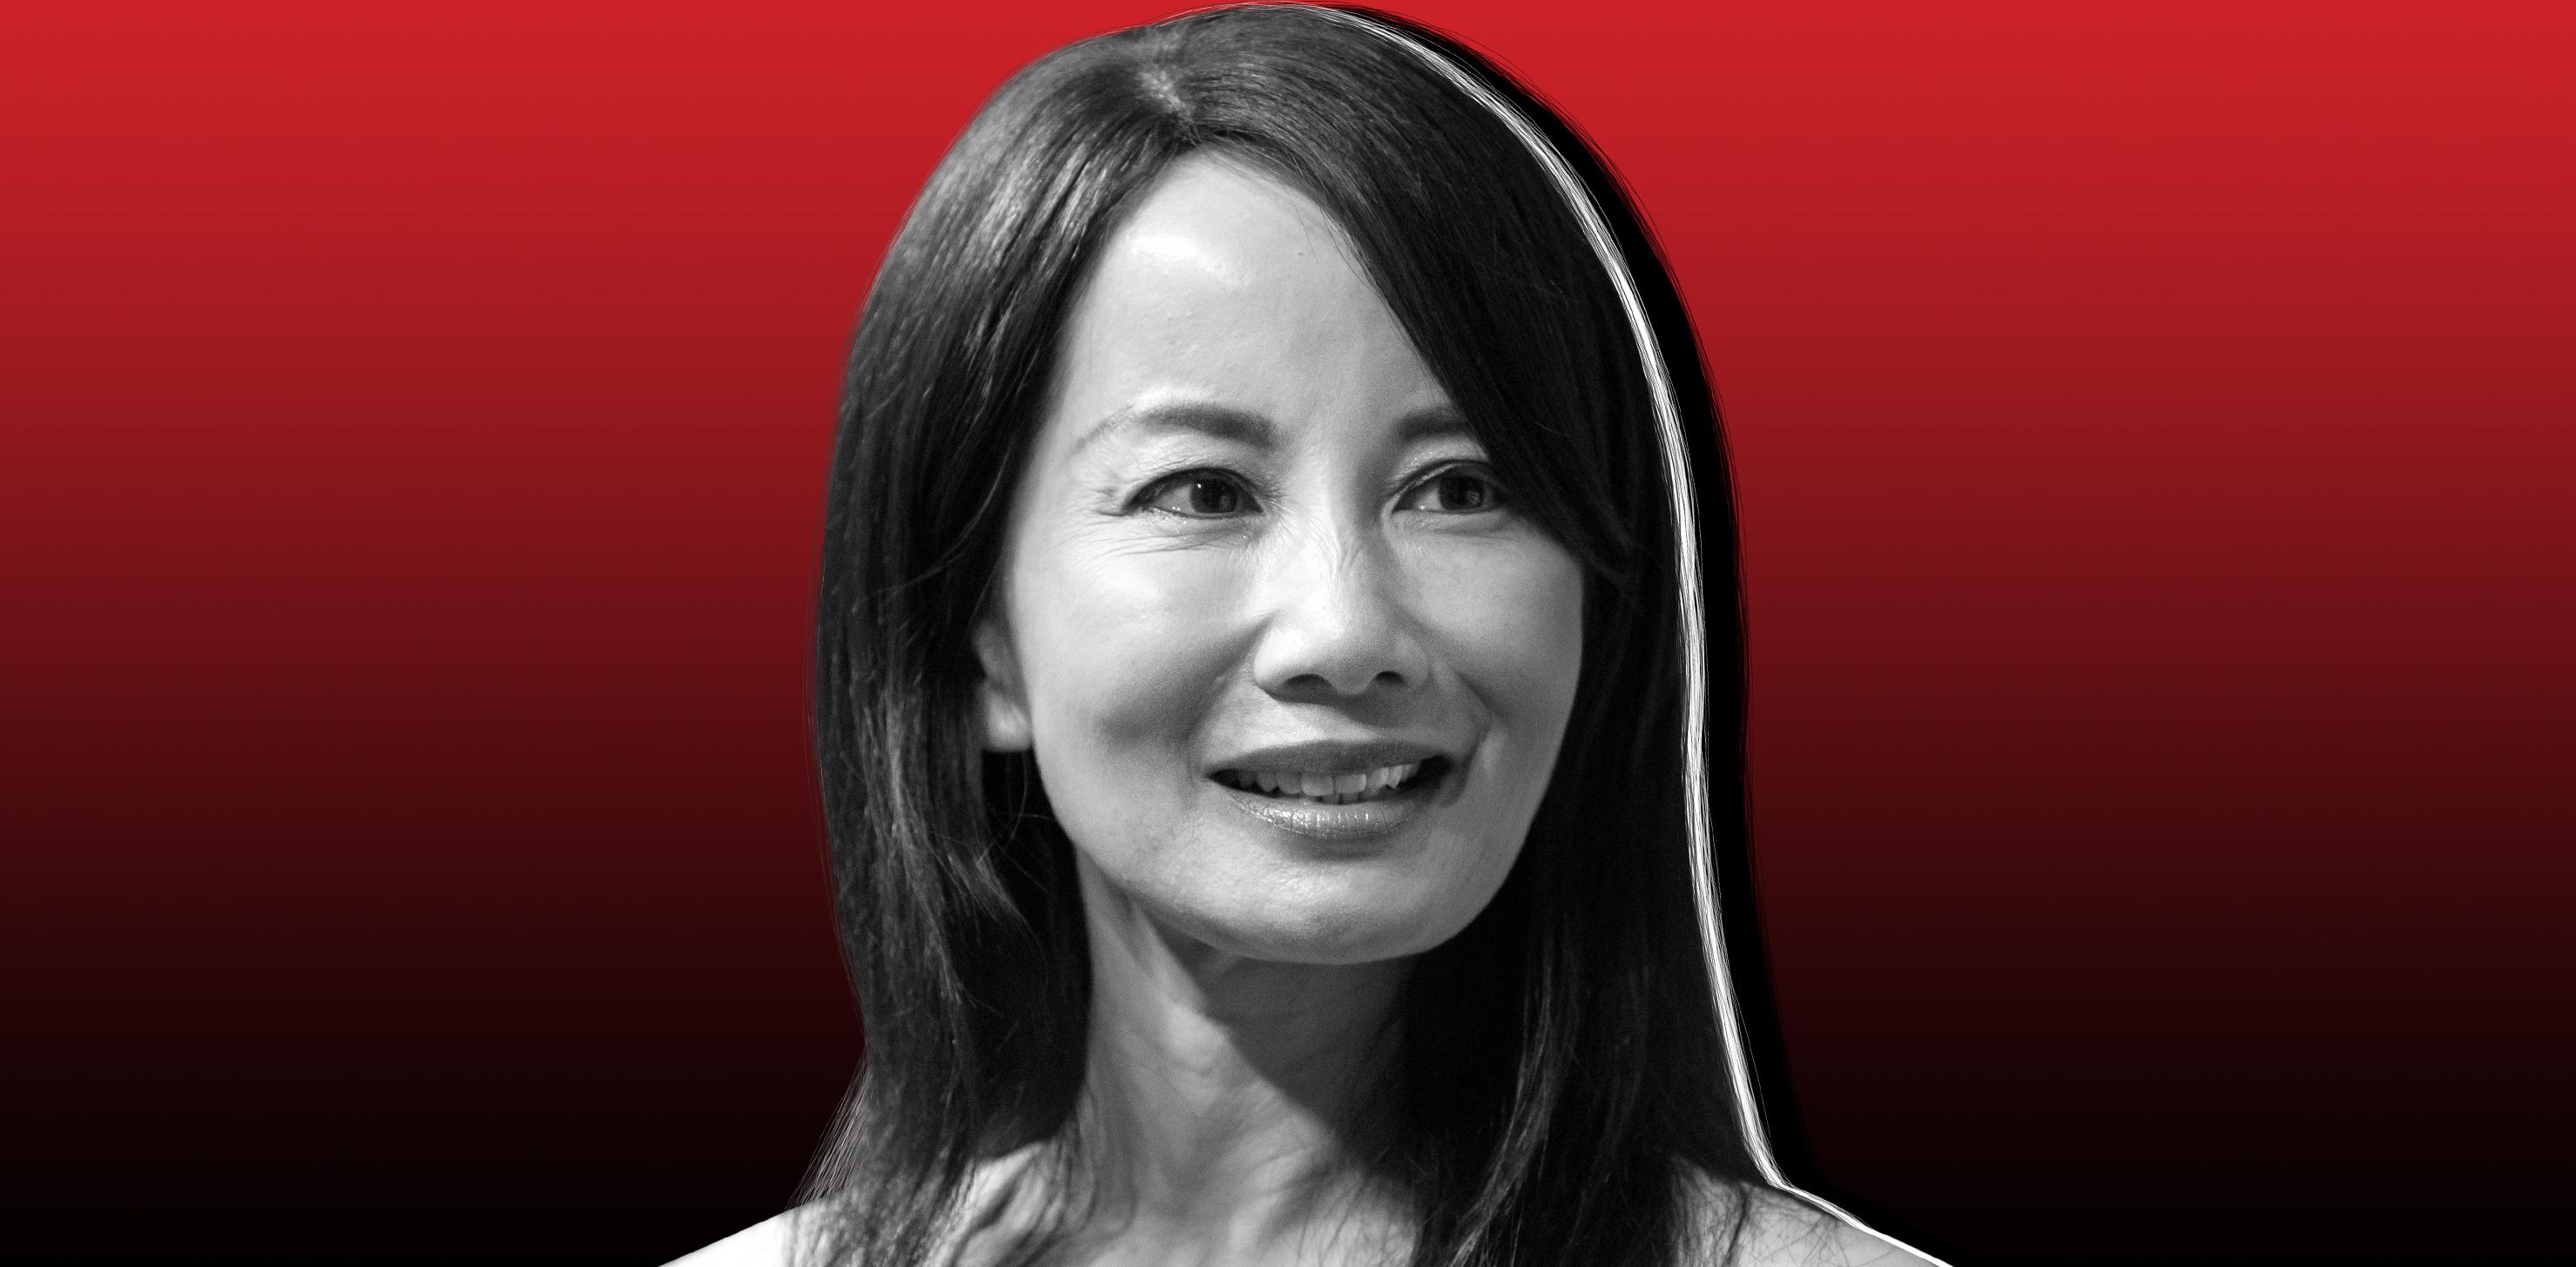 IMPW 2019. 38. Jane Jie Sun